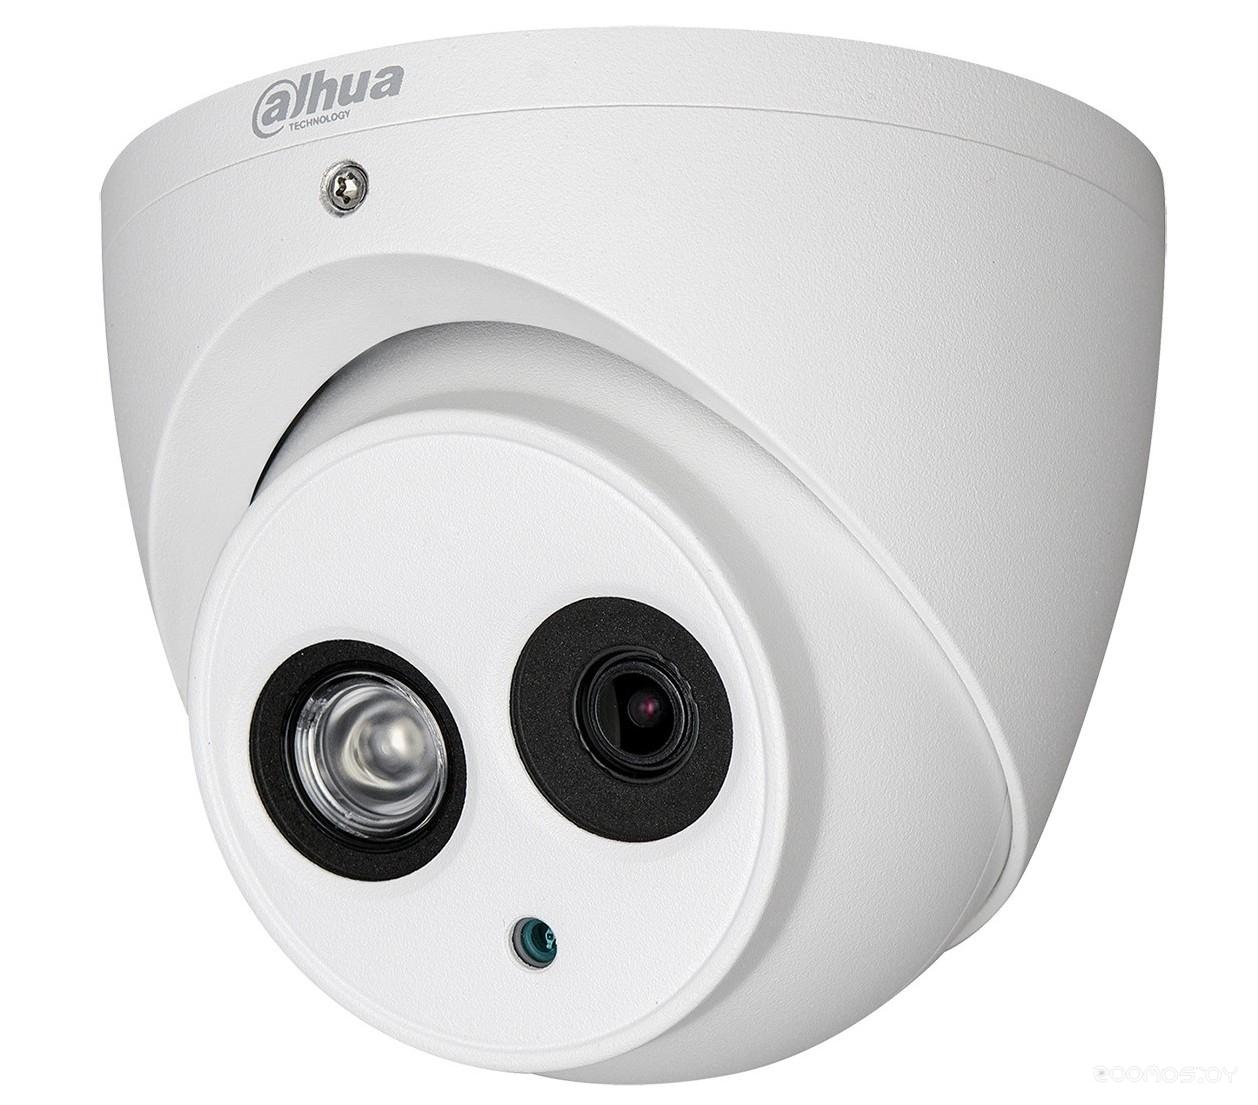 Камера CCTV Dahua DH-HAC-HDW2221EMP-0360B